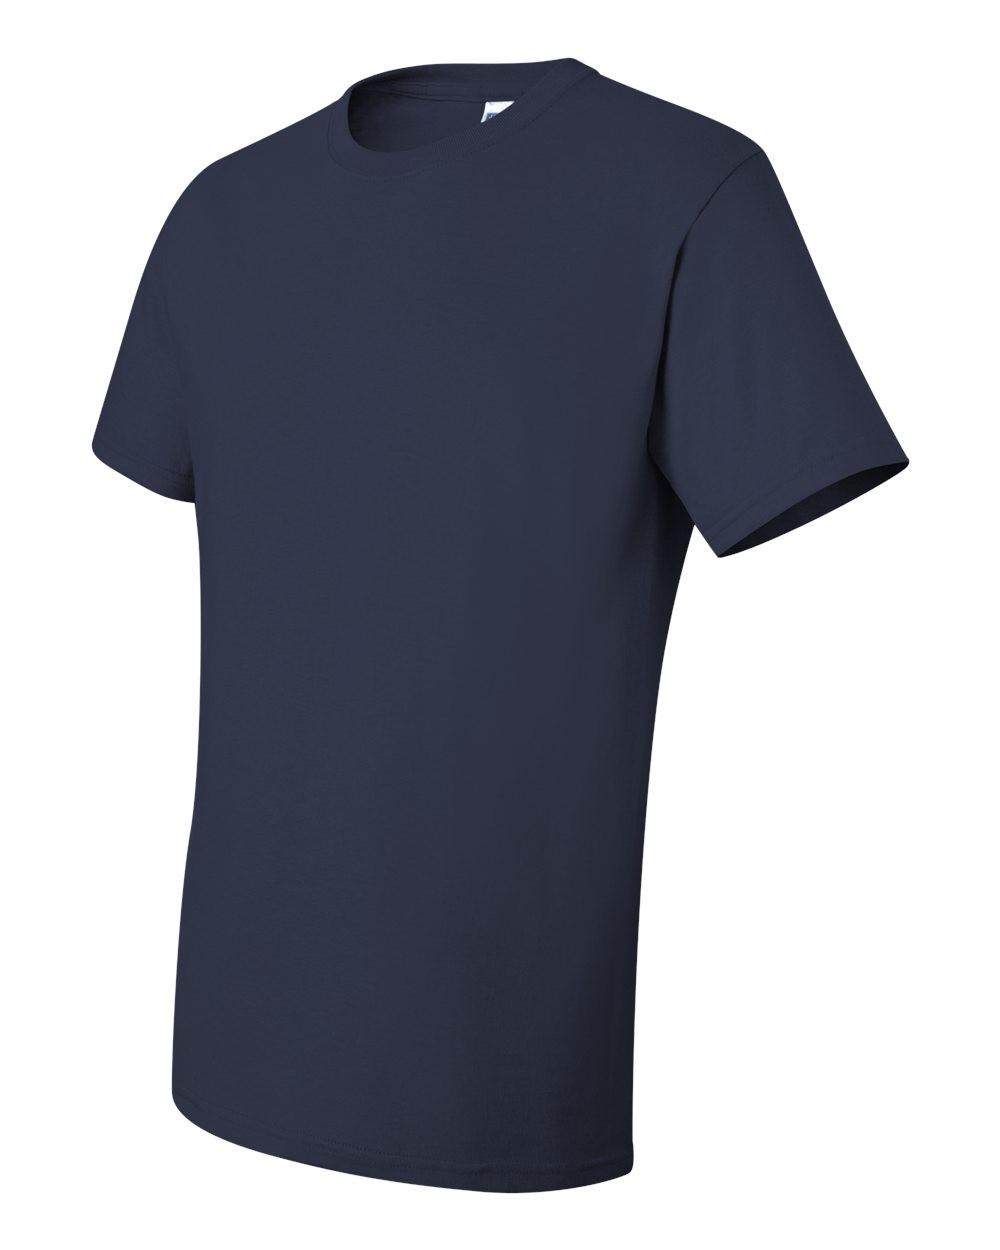 OLPH Gym T-Shirt w/ Logo